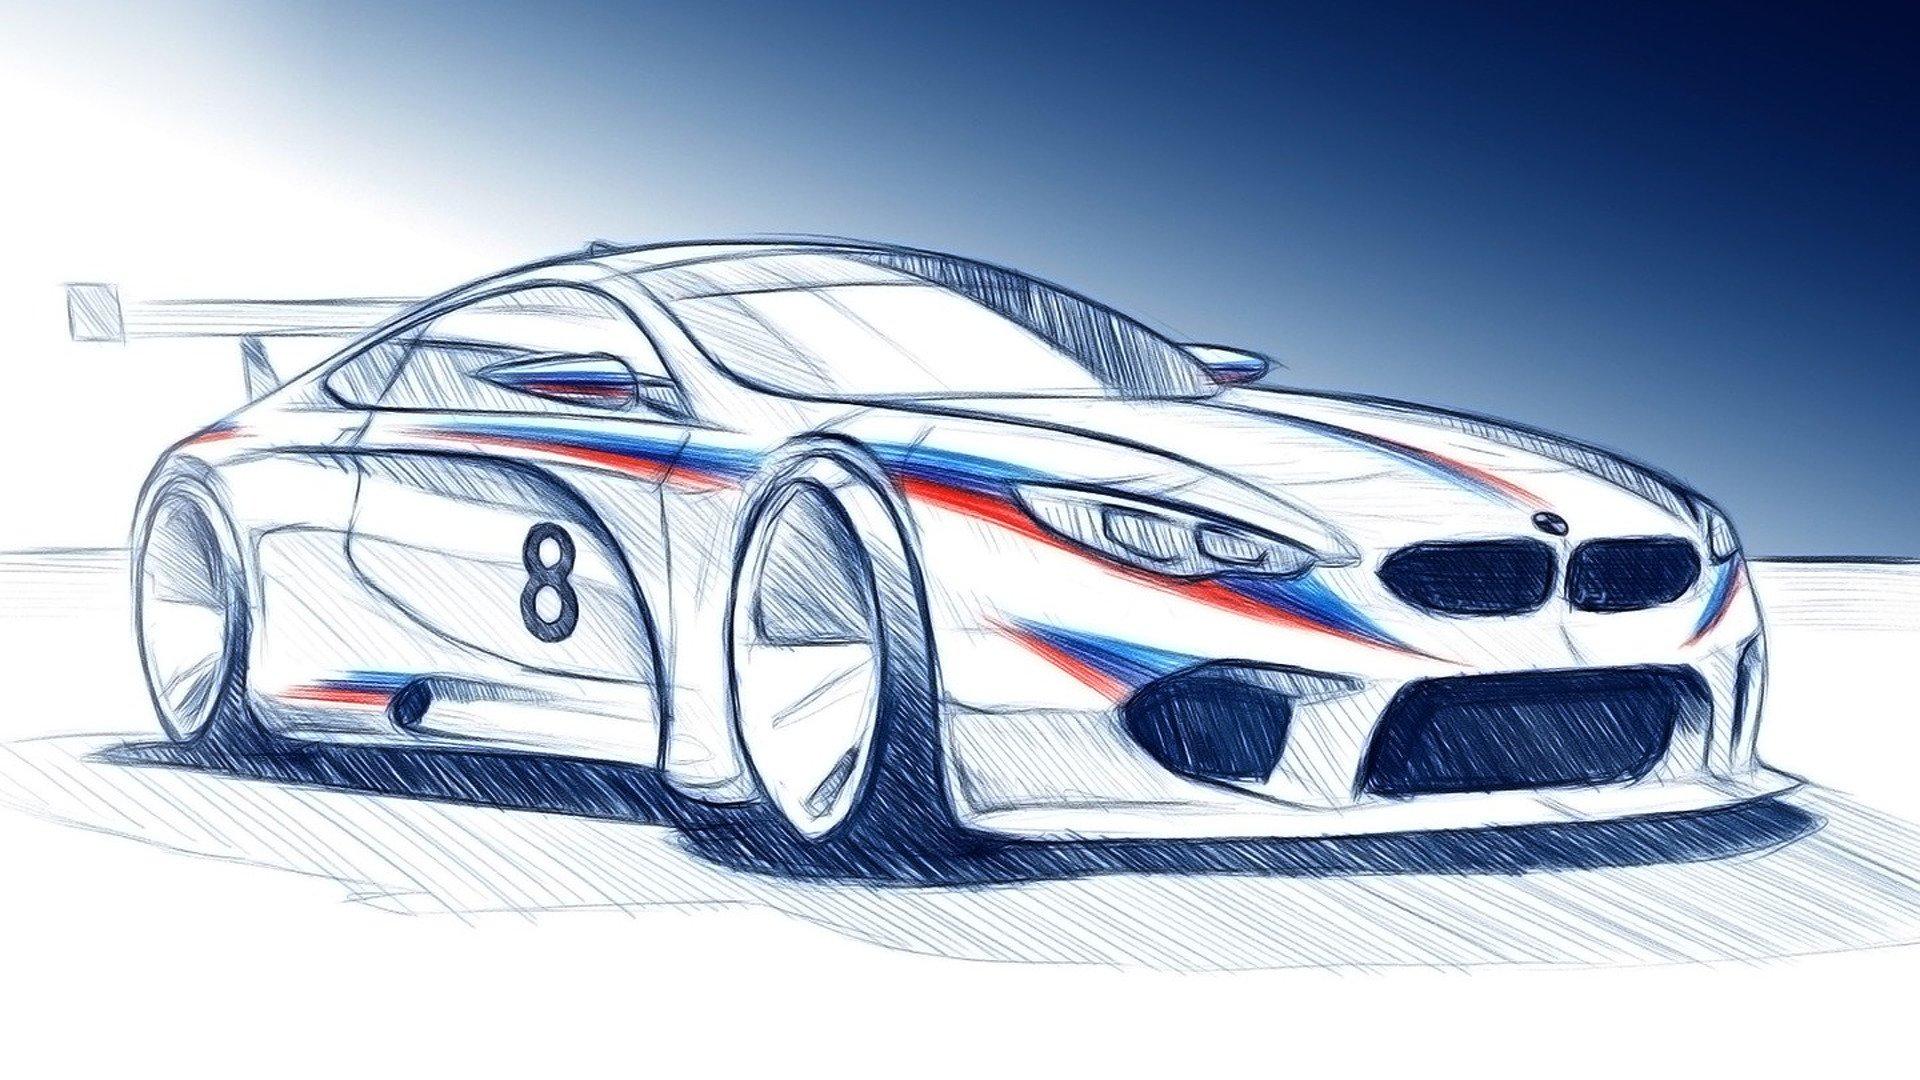 БМВ показала тизер гоночного купе M8 GTE